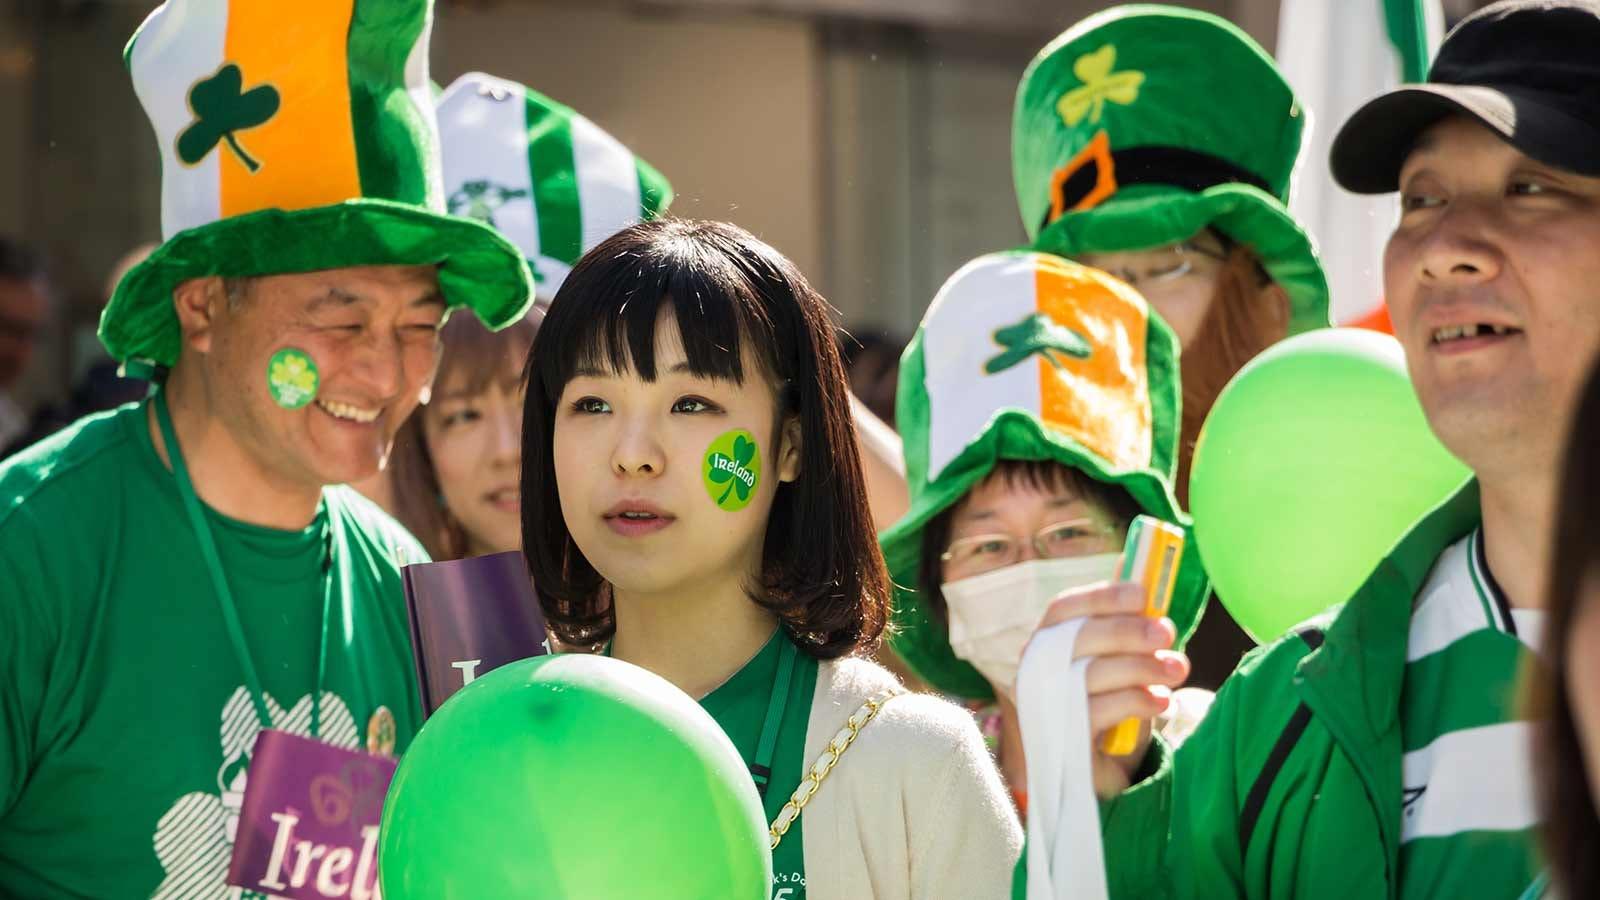 Japanese citizens celebrating St. Patrick's Day